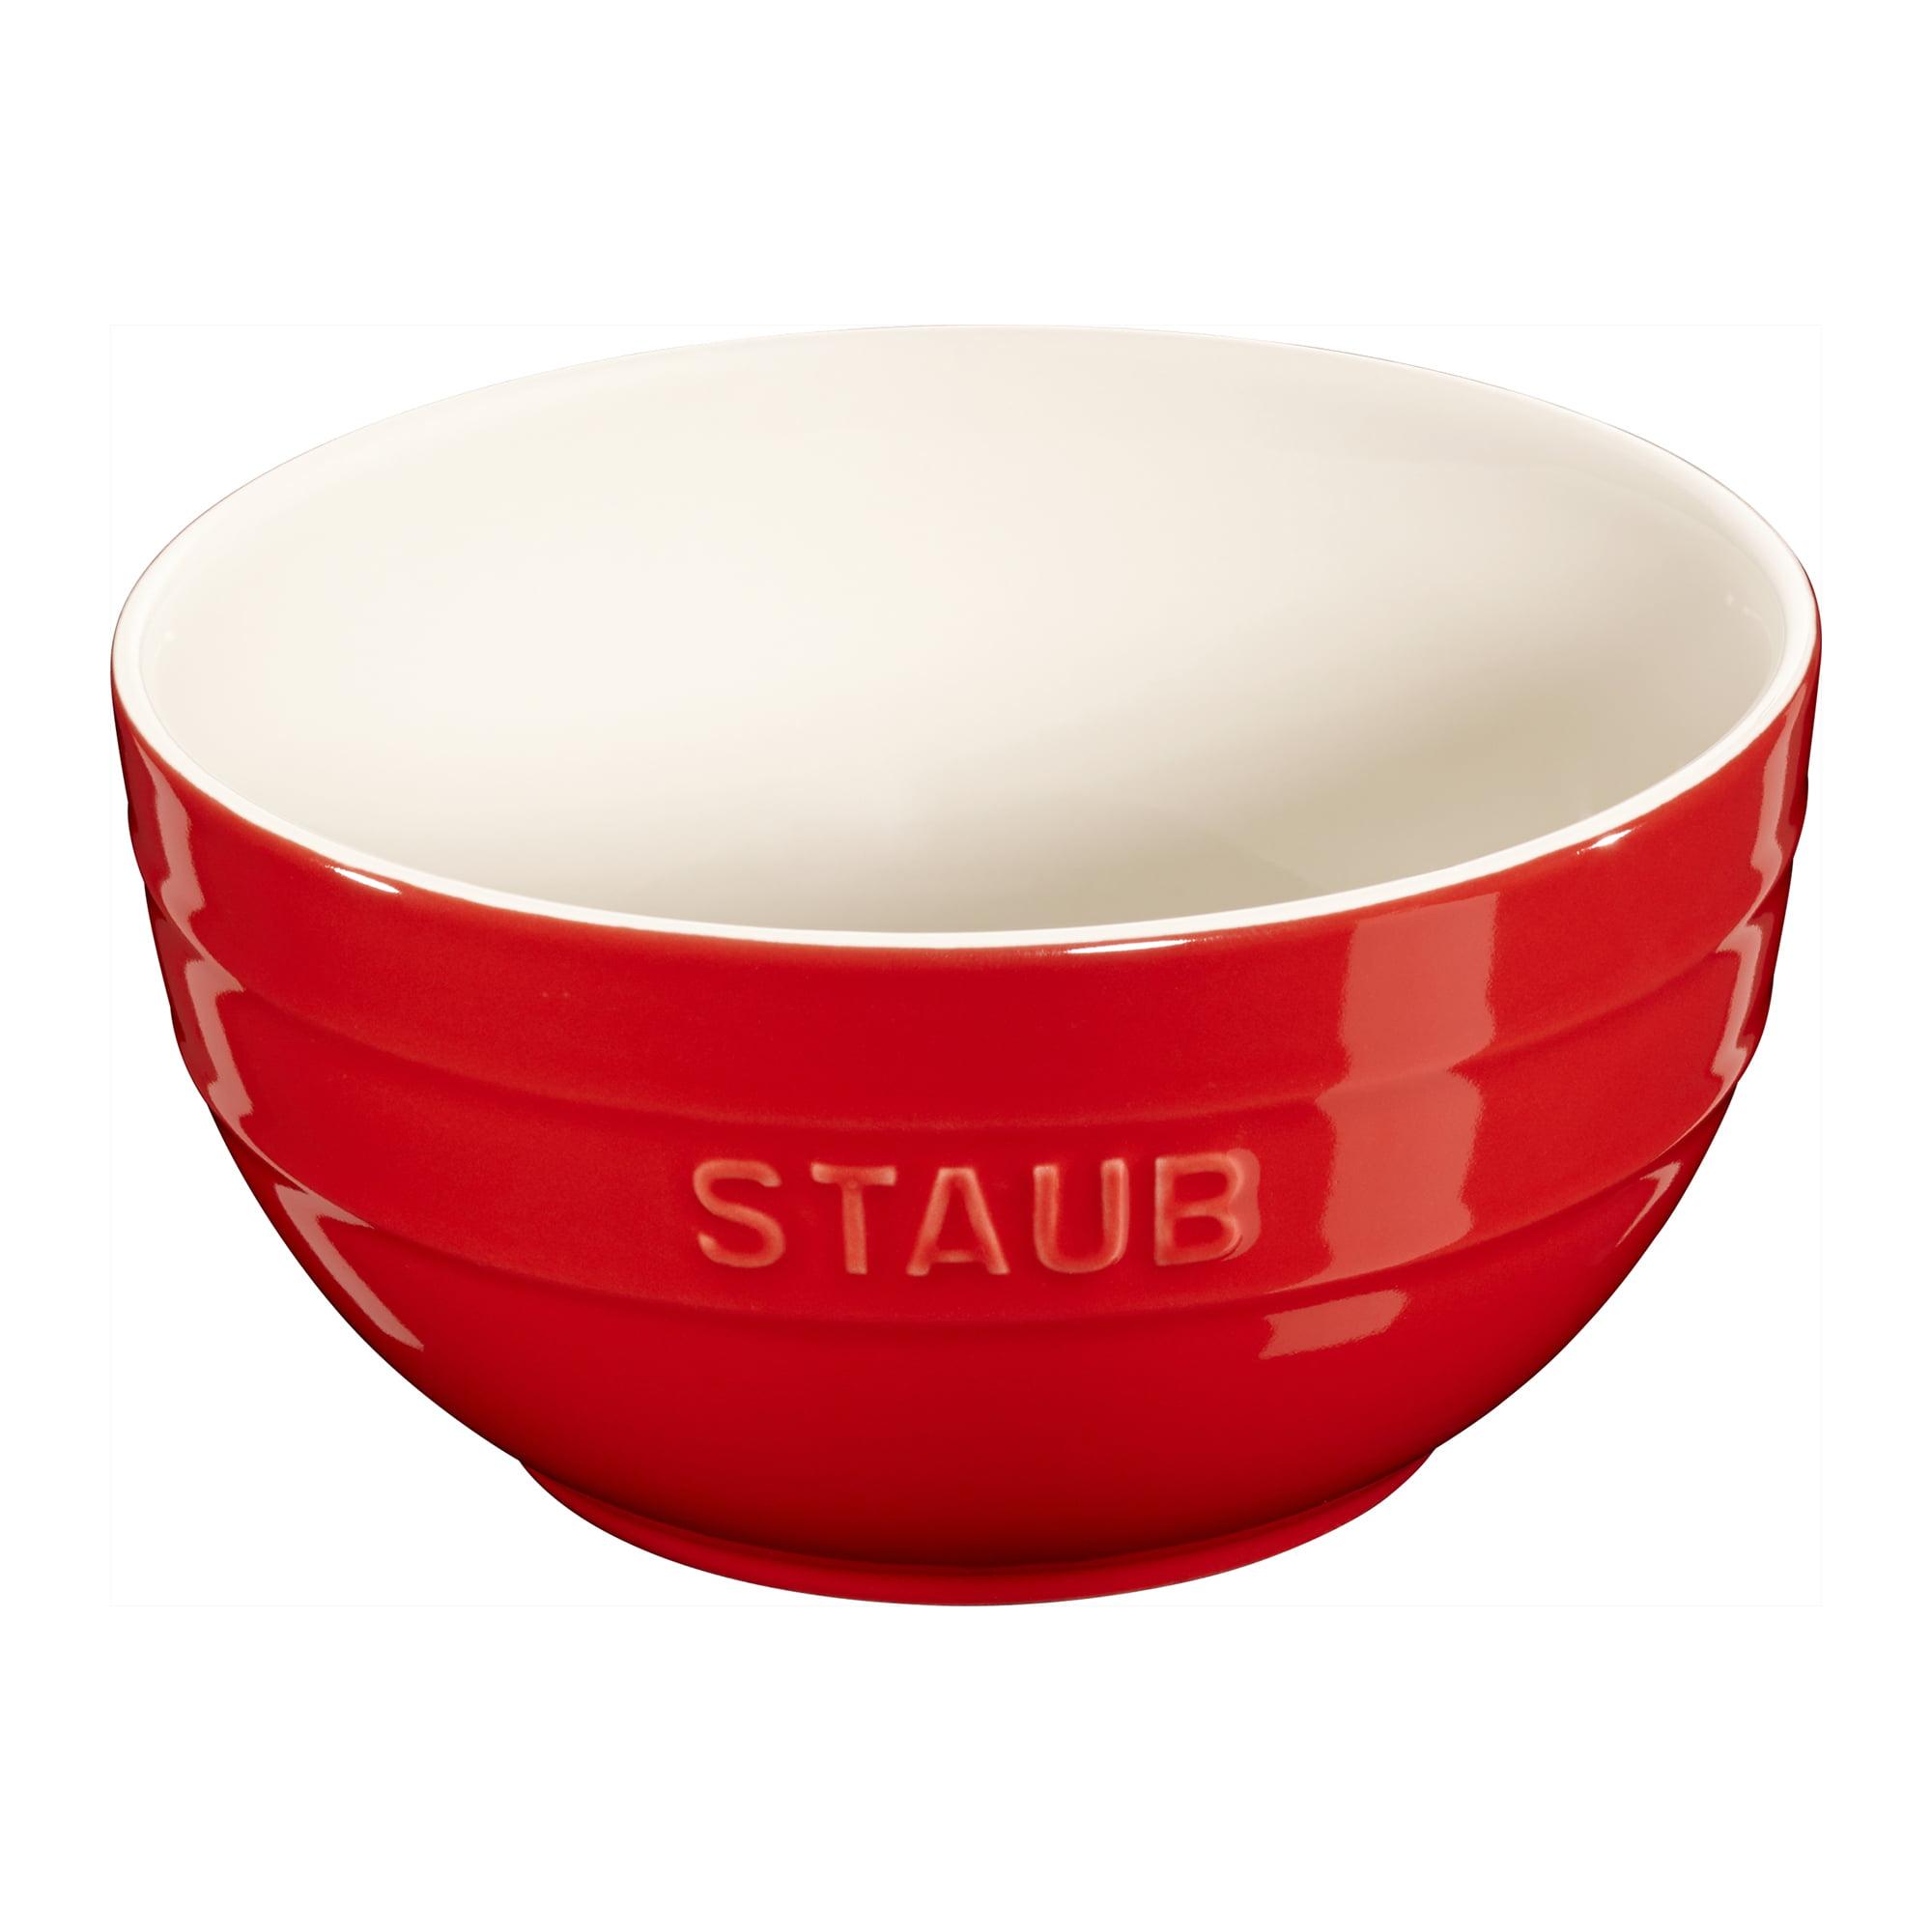 "Staub Ceramic 6.5"" Large Universal Bowl - Cherry"